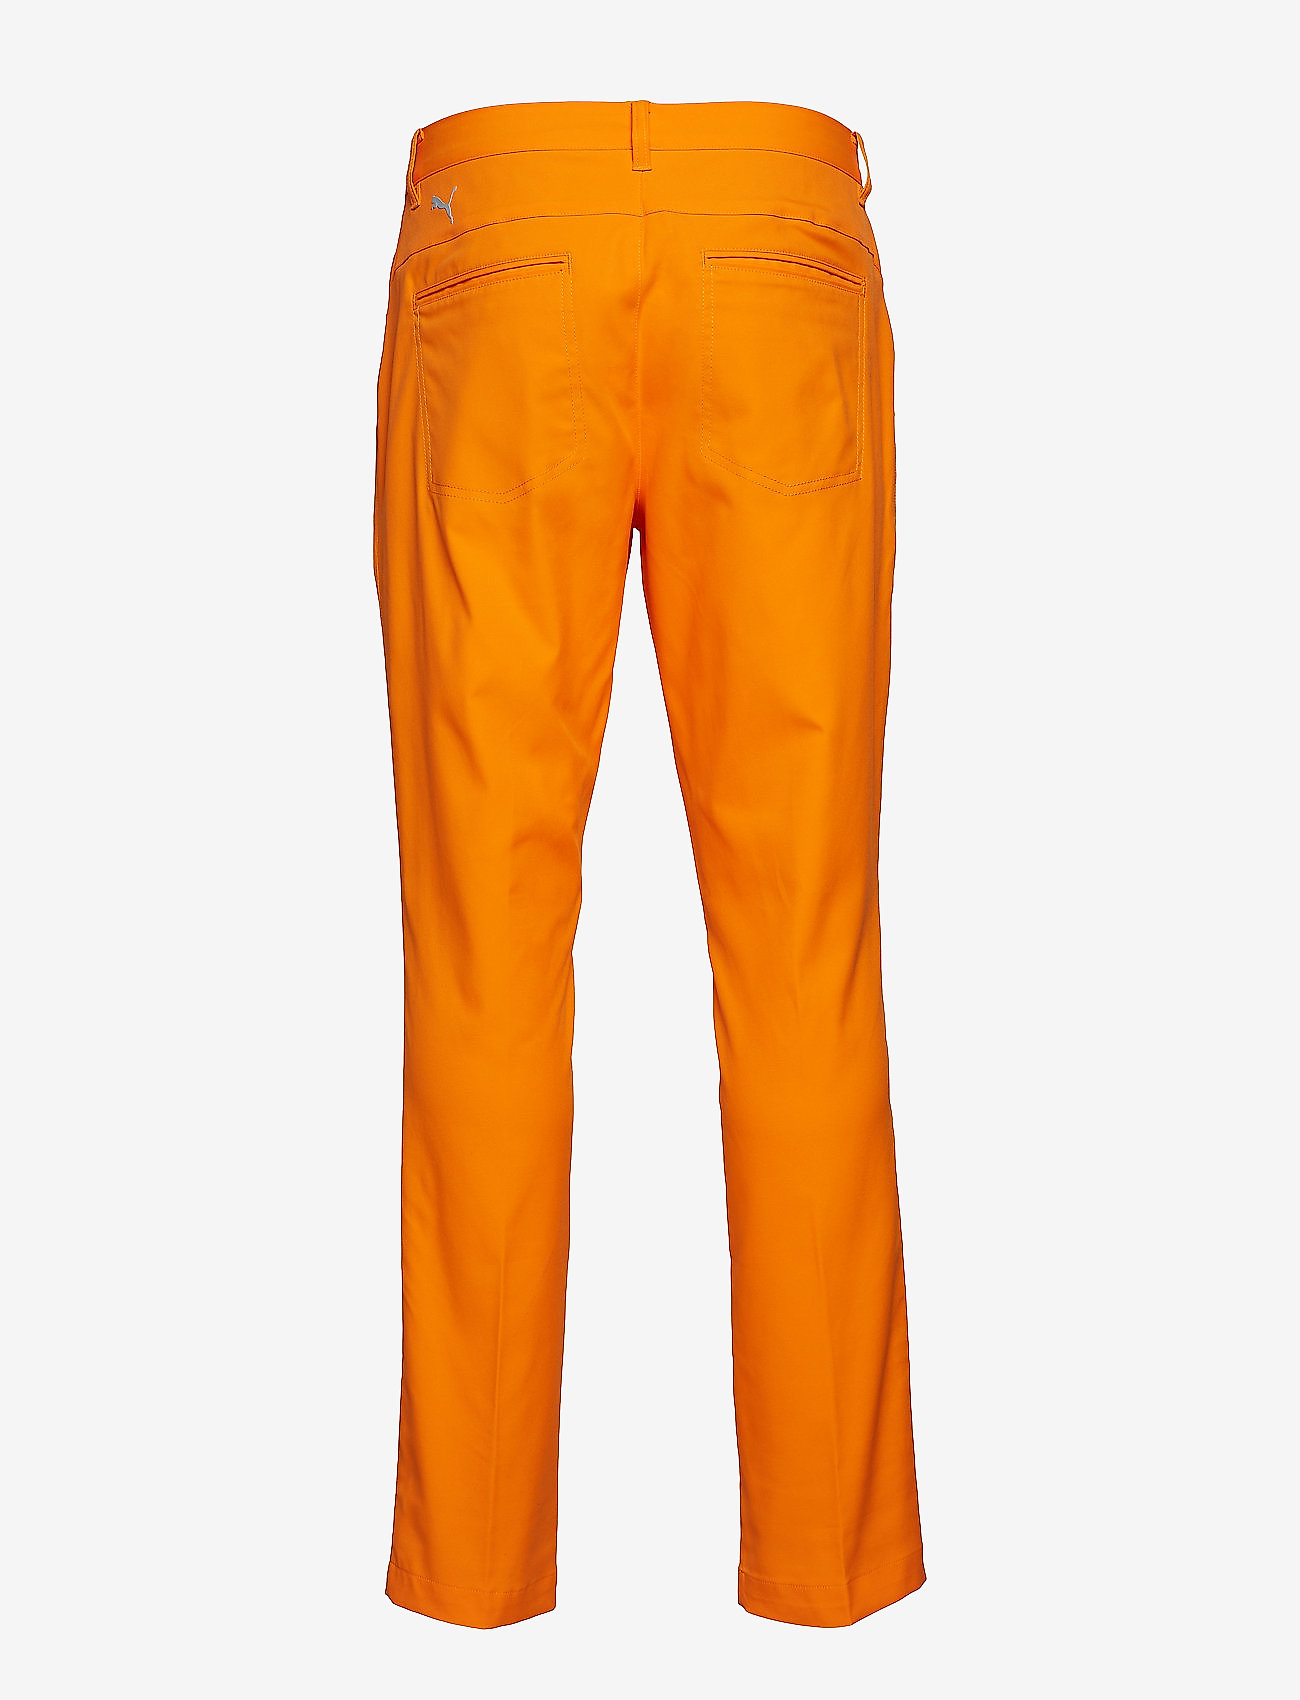 PUMA Golf - Jackpot 5 Pocket Pant - golfbukser - vibrant orange - 1